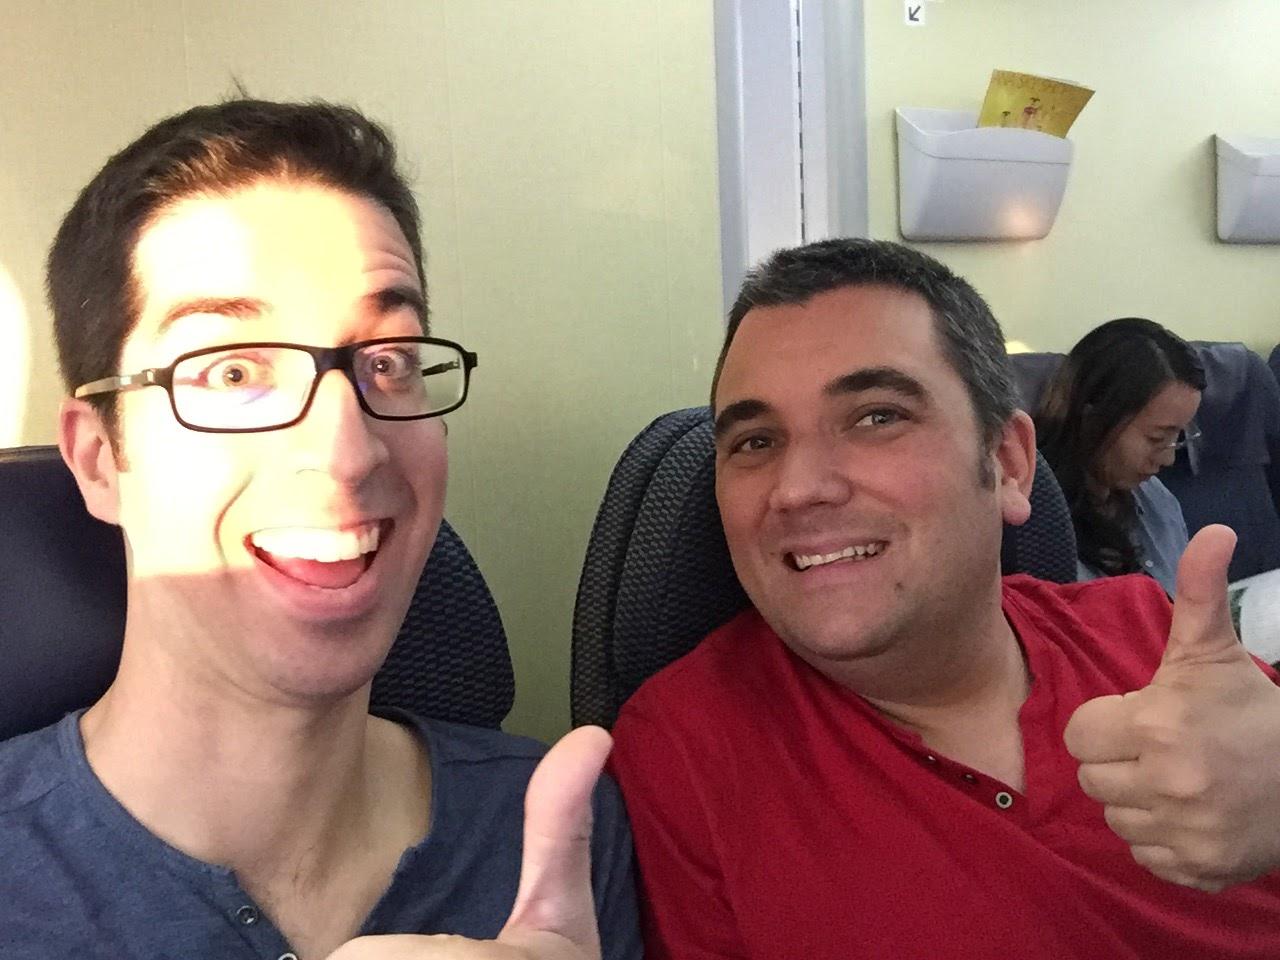 Inside ANA's plane